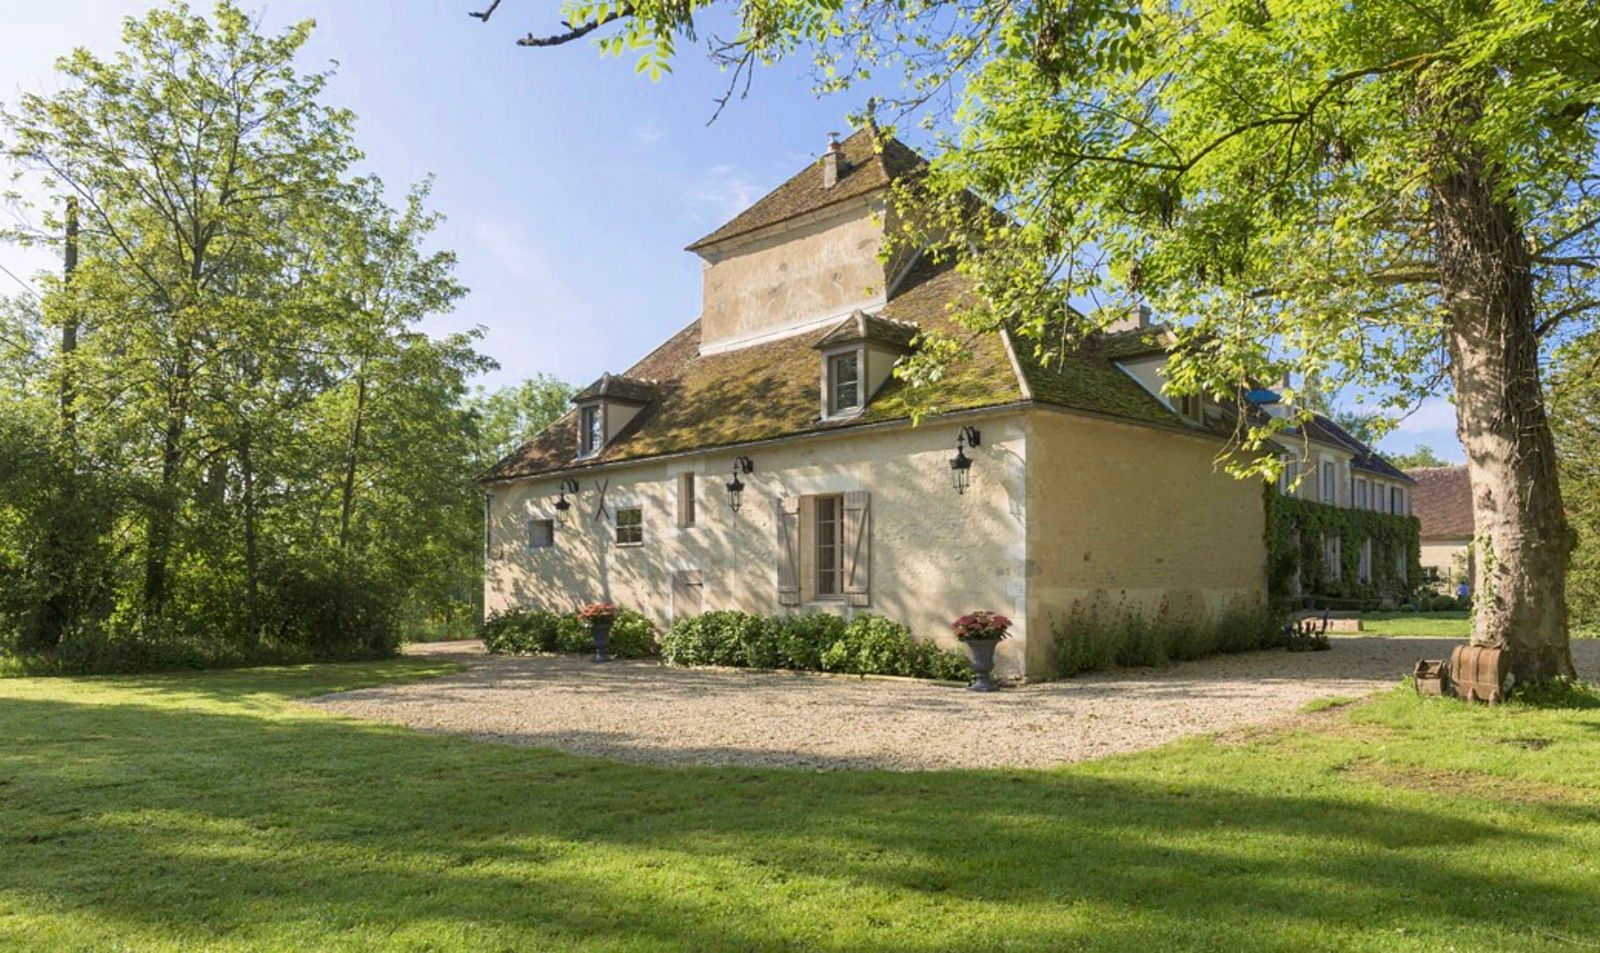 Loue gîte de charme en Bourgogne